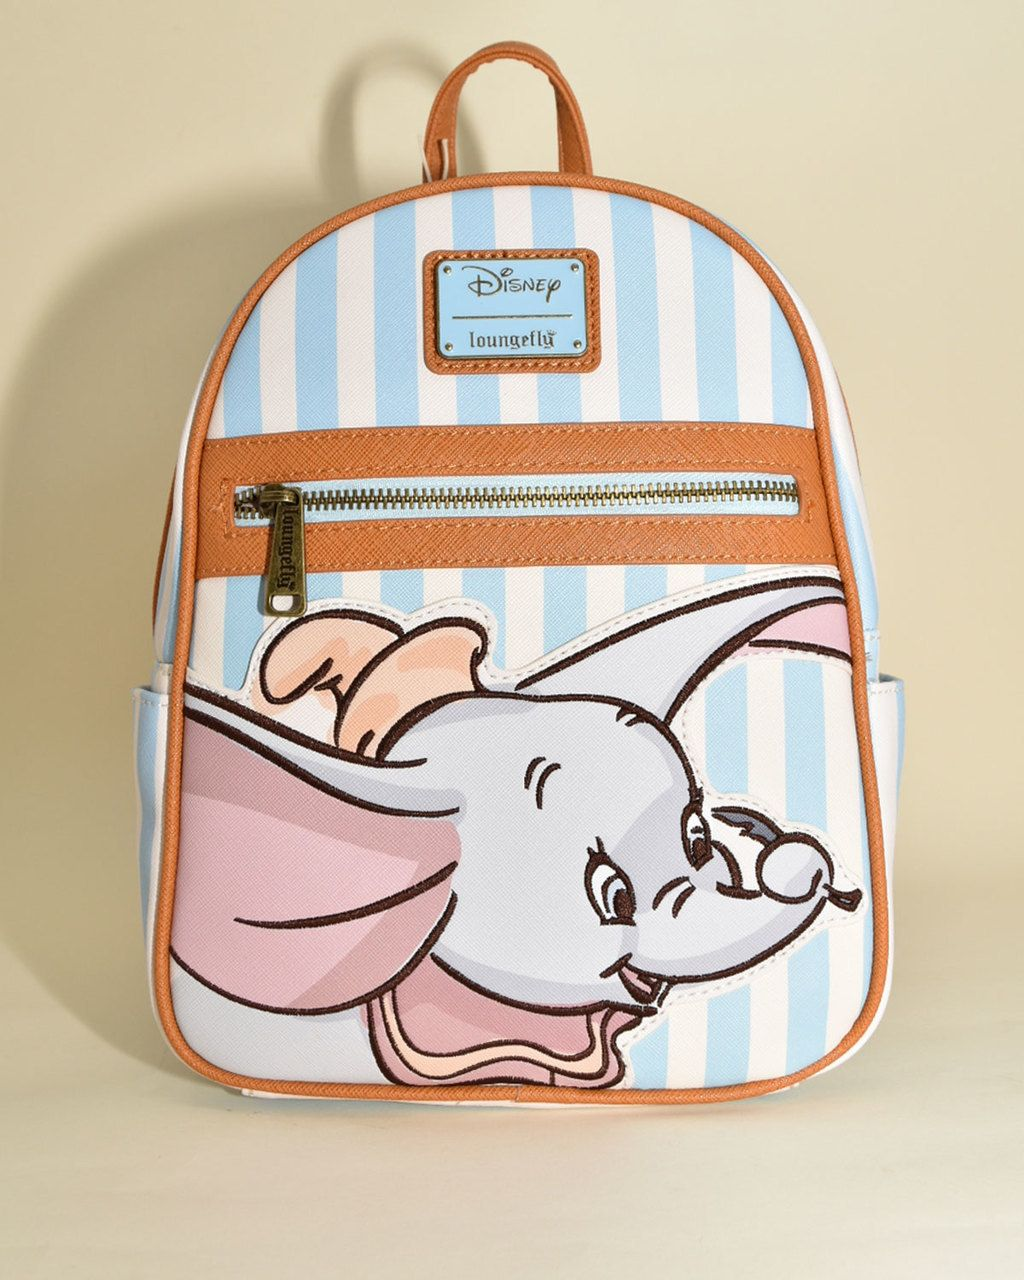 b3dc4ddafa5 Loungefly x Disney's Dumbo Striped Faux Leather Mini Backpack - Sidecca